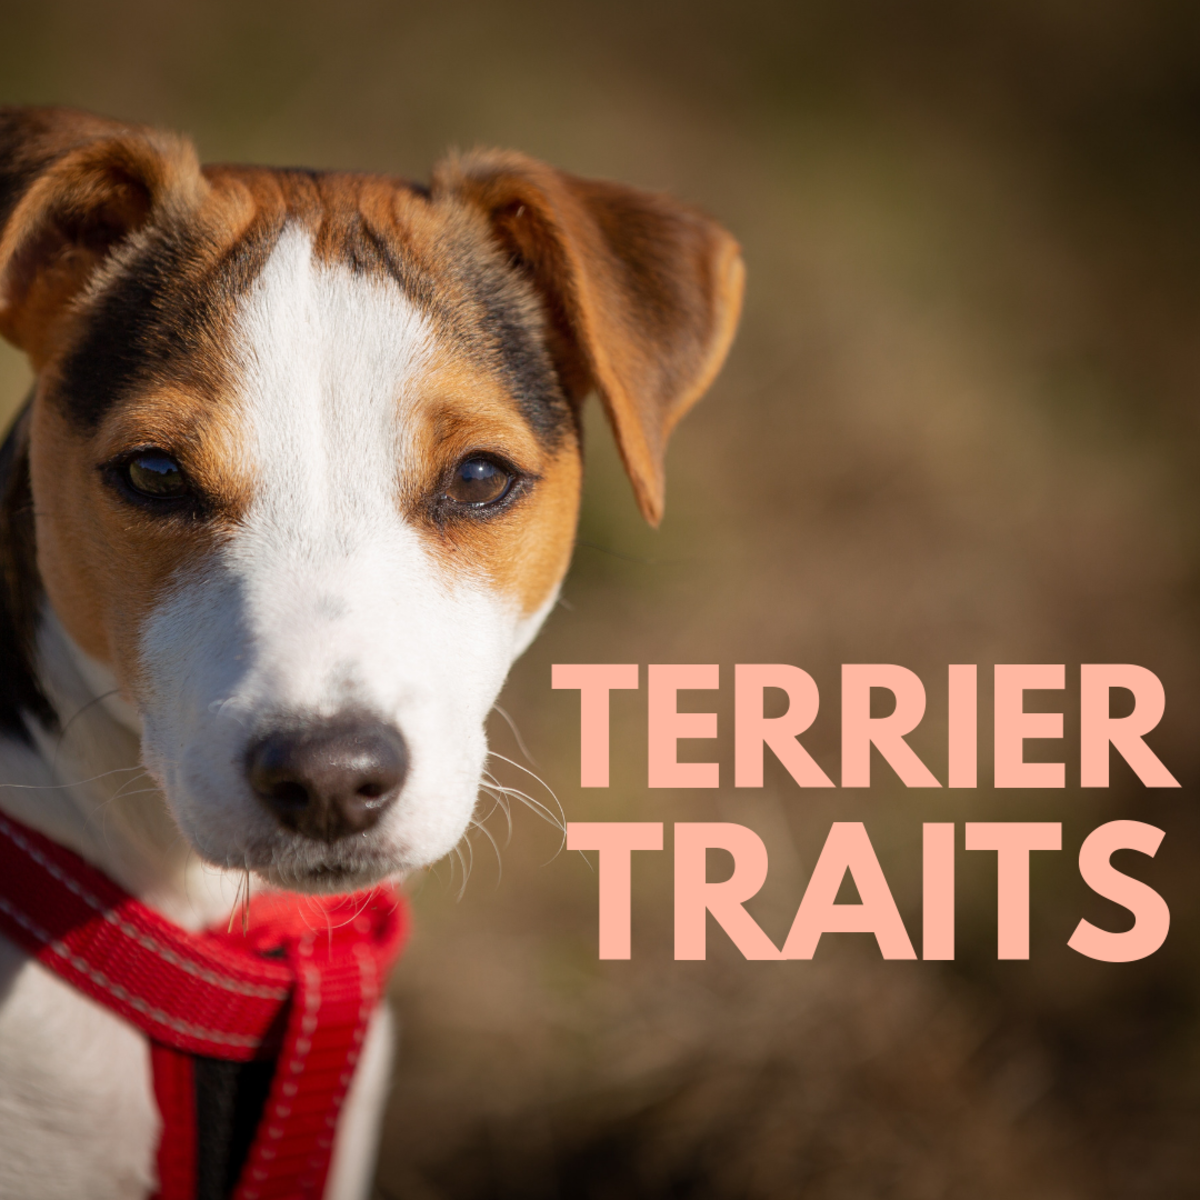 Terrier Traits